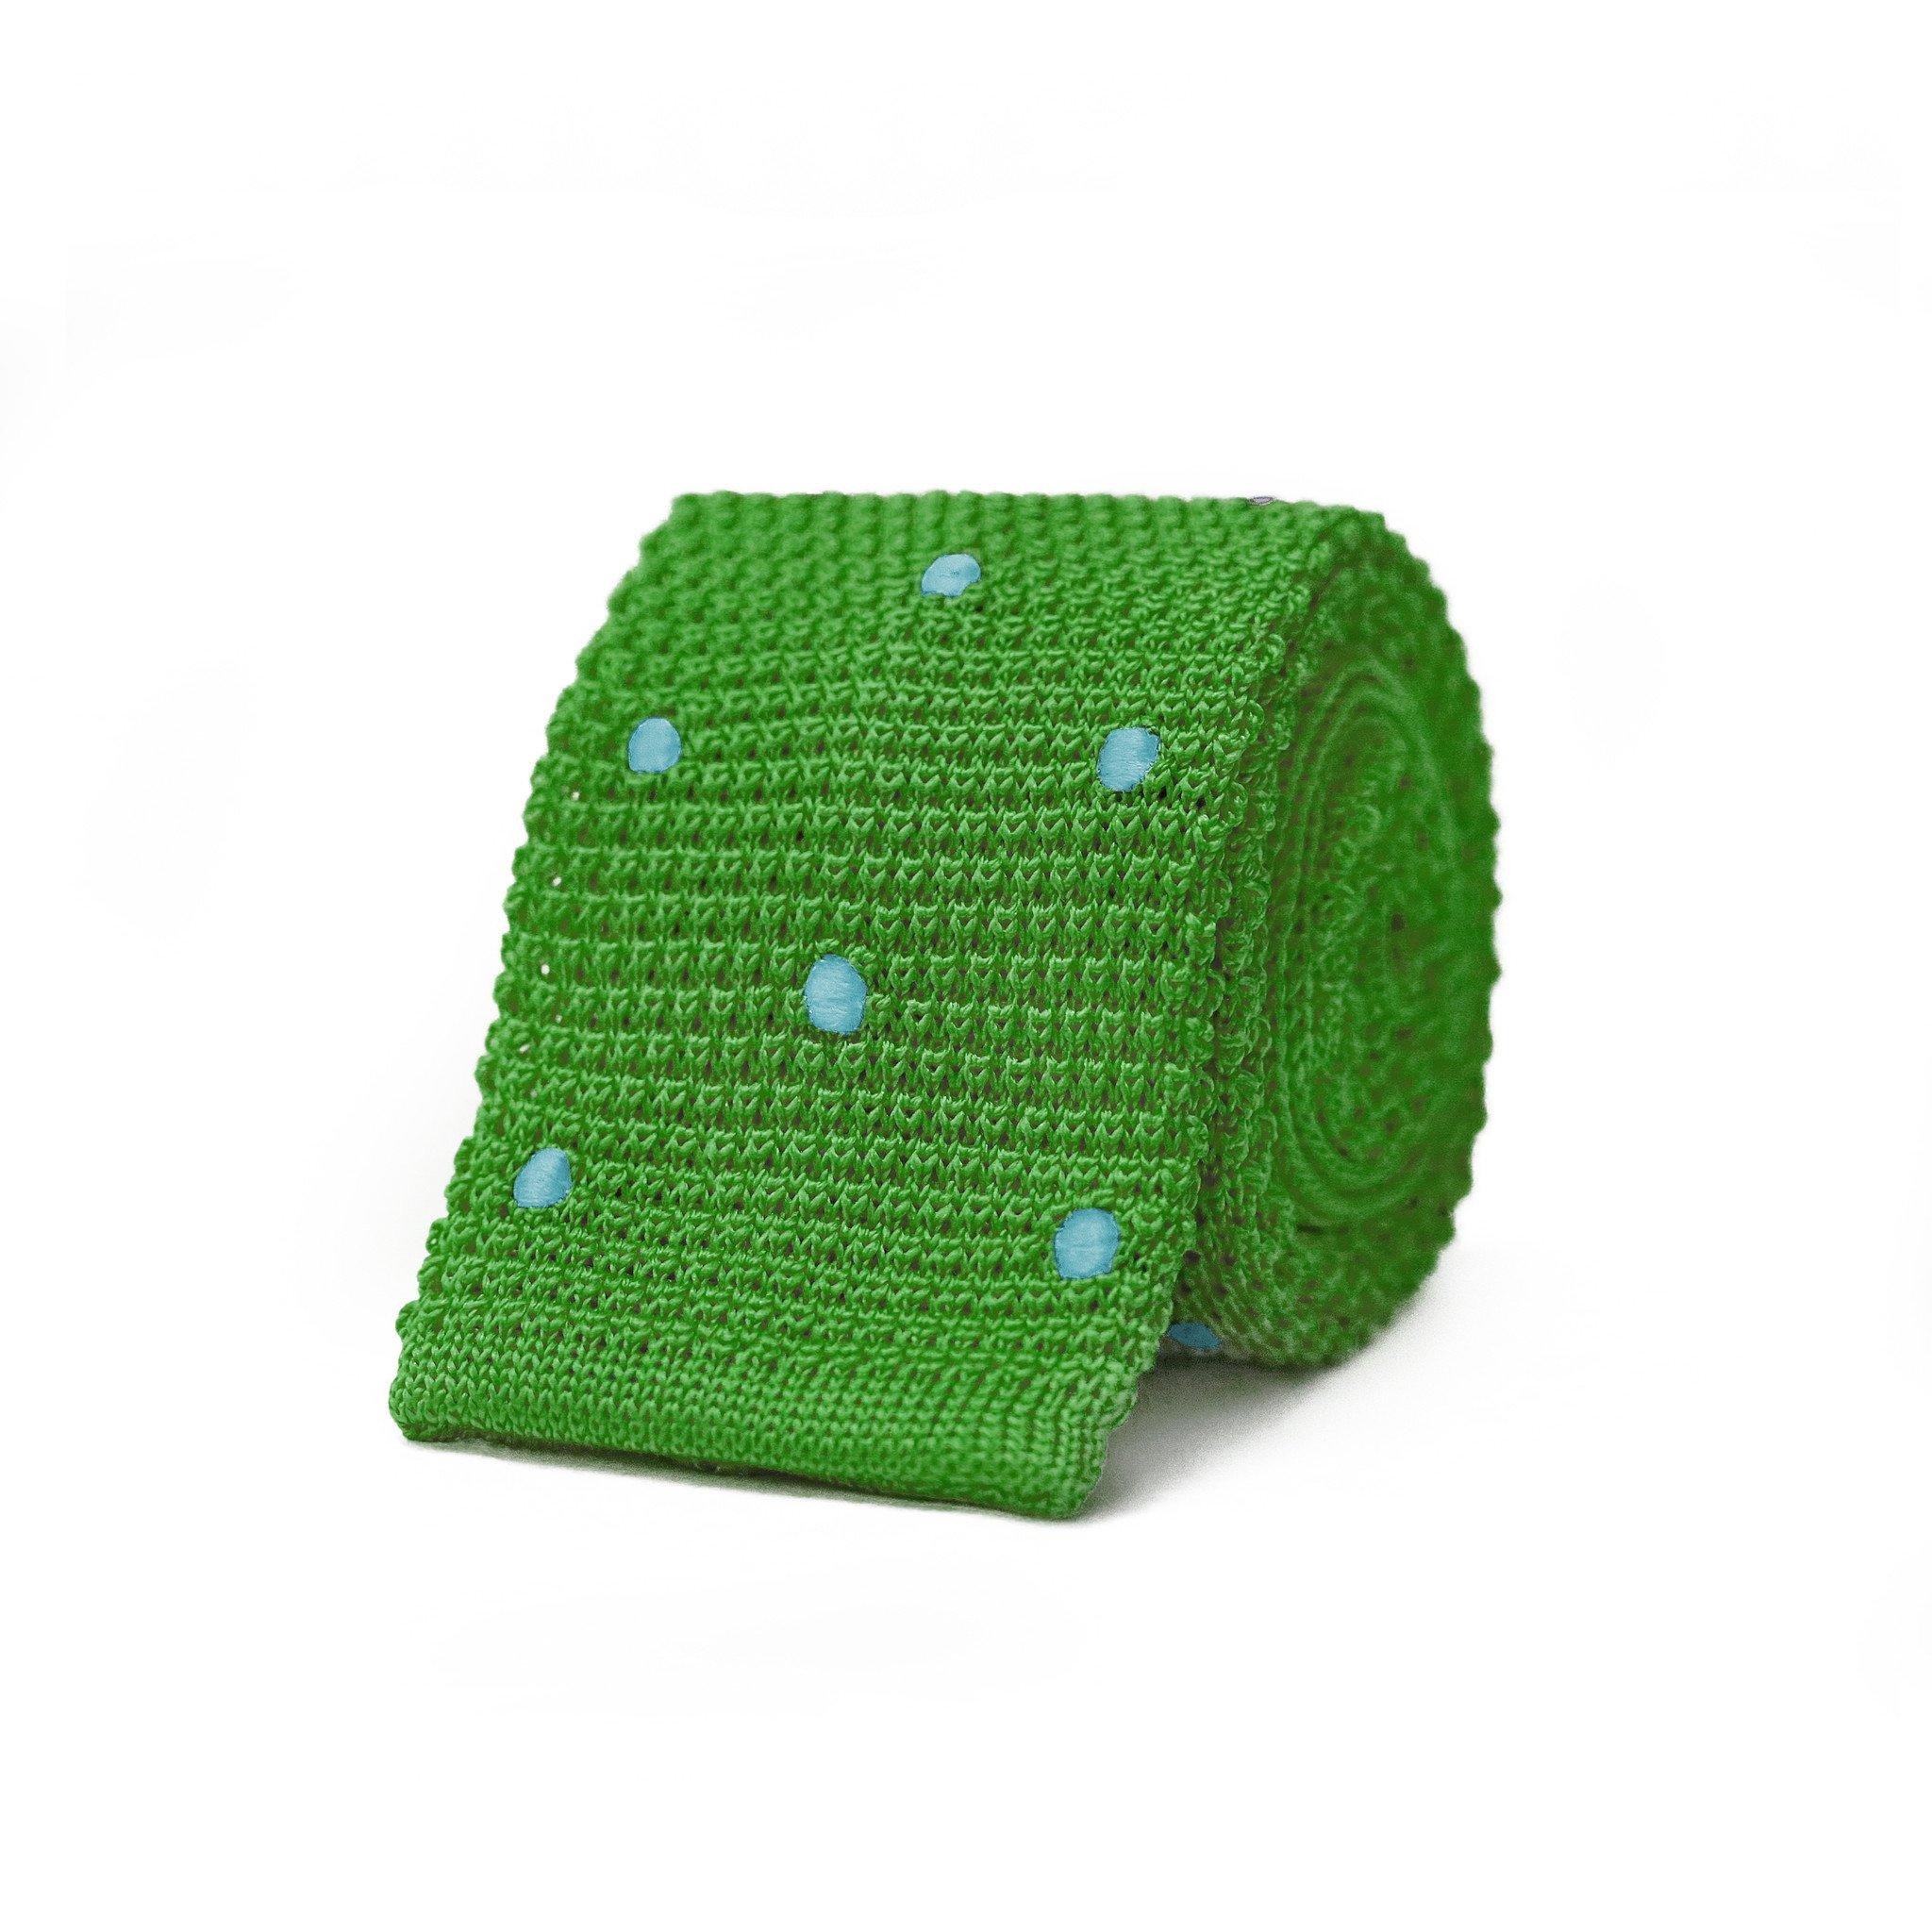 Susy Knit Tie - Green